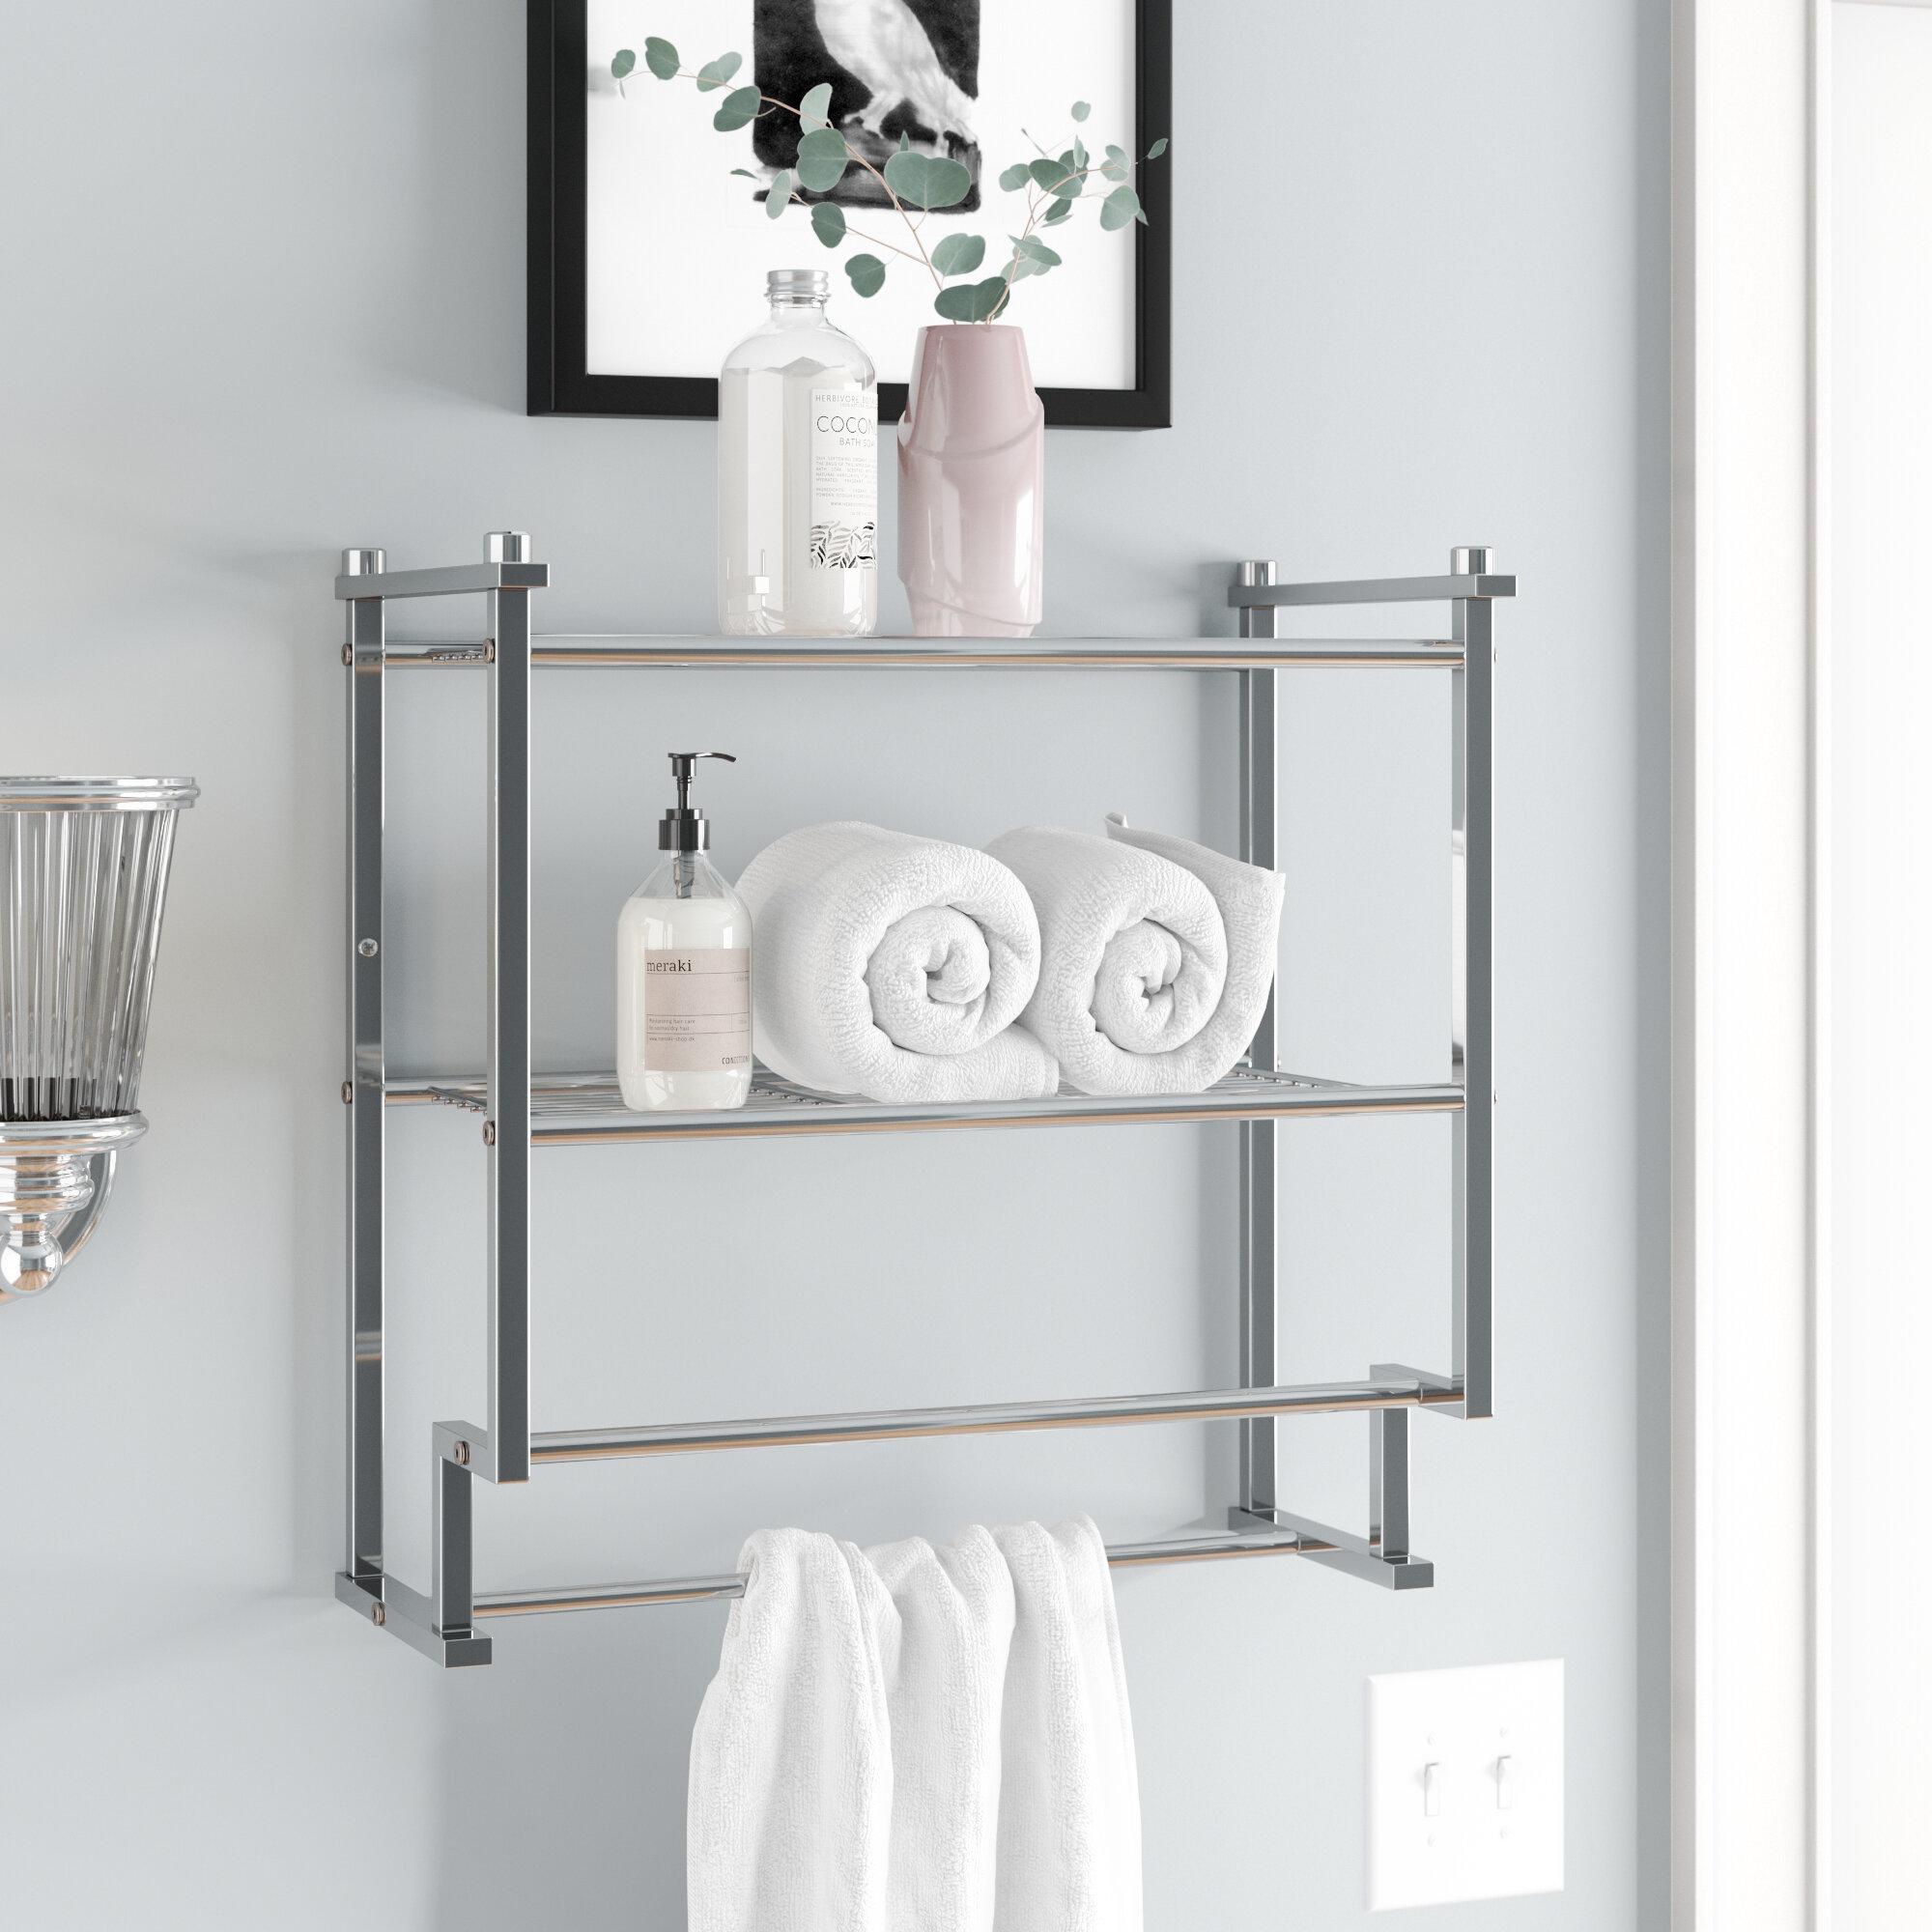 Bathroom Shelves With Towel Bar You Ll Love In 2021 Wayfair